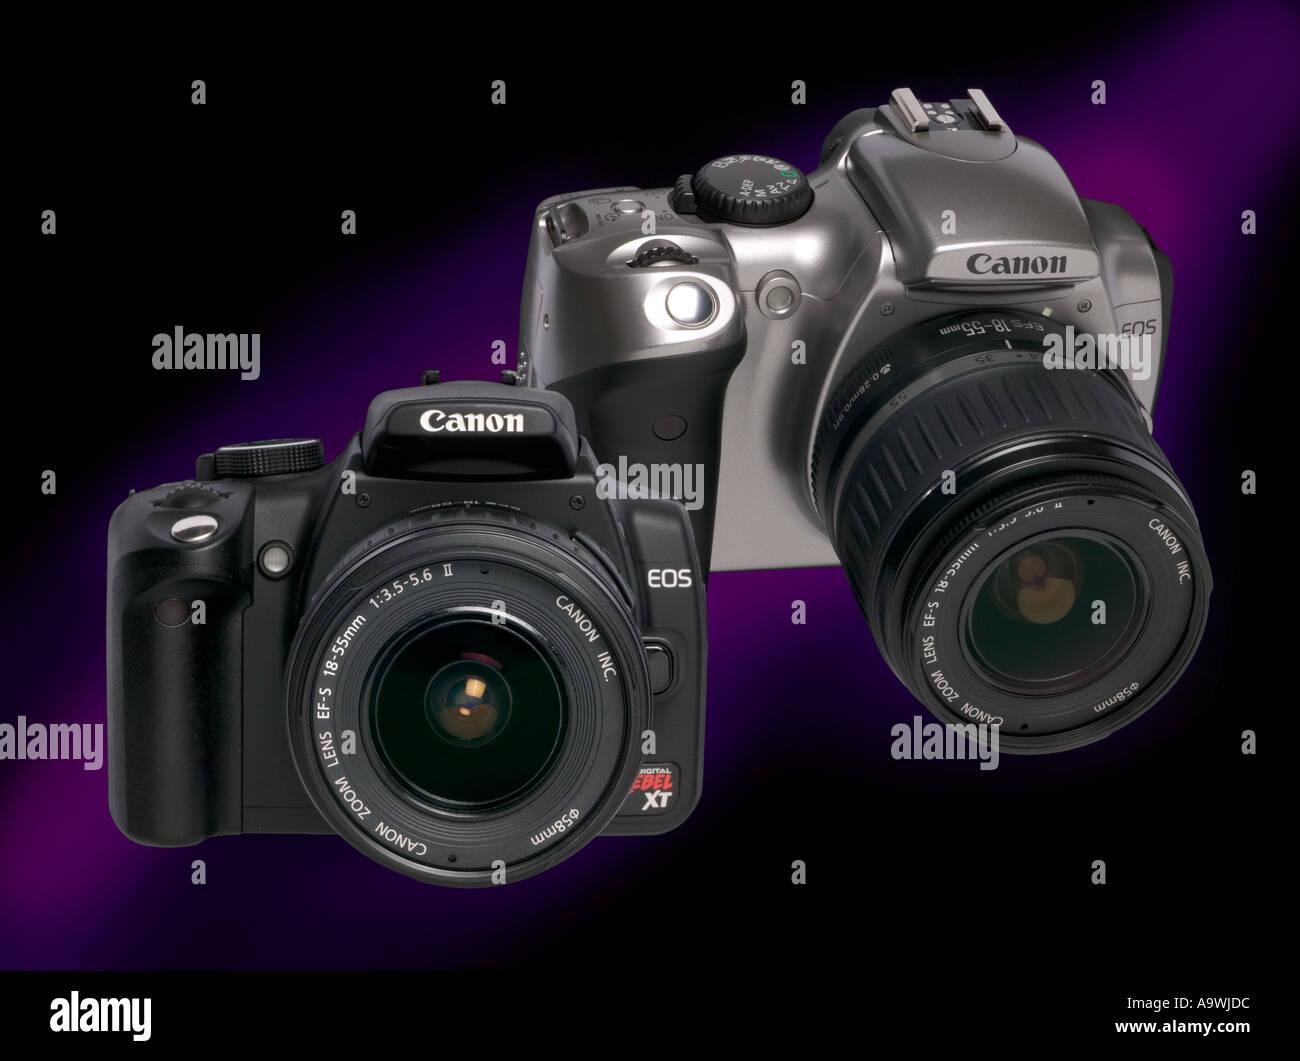 Comparison between Canon digital SLR cameras Canon 300d, 6mp and 350d 350XT digital SLR camera 8mp six megapixel - Stock Image